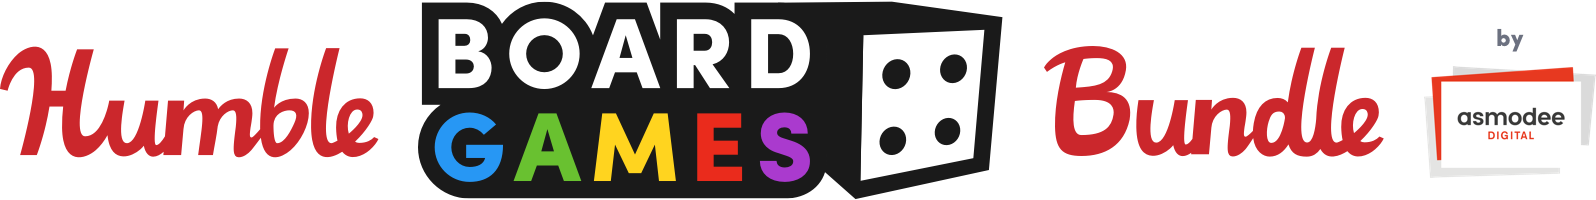 The Humble Board Games Bundle by Asmodee Digital